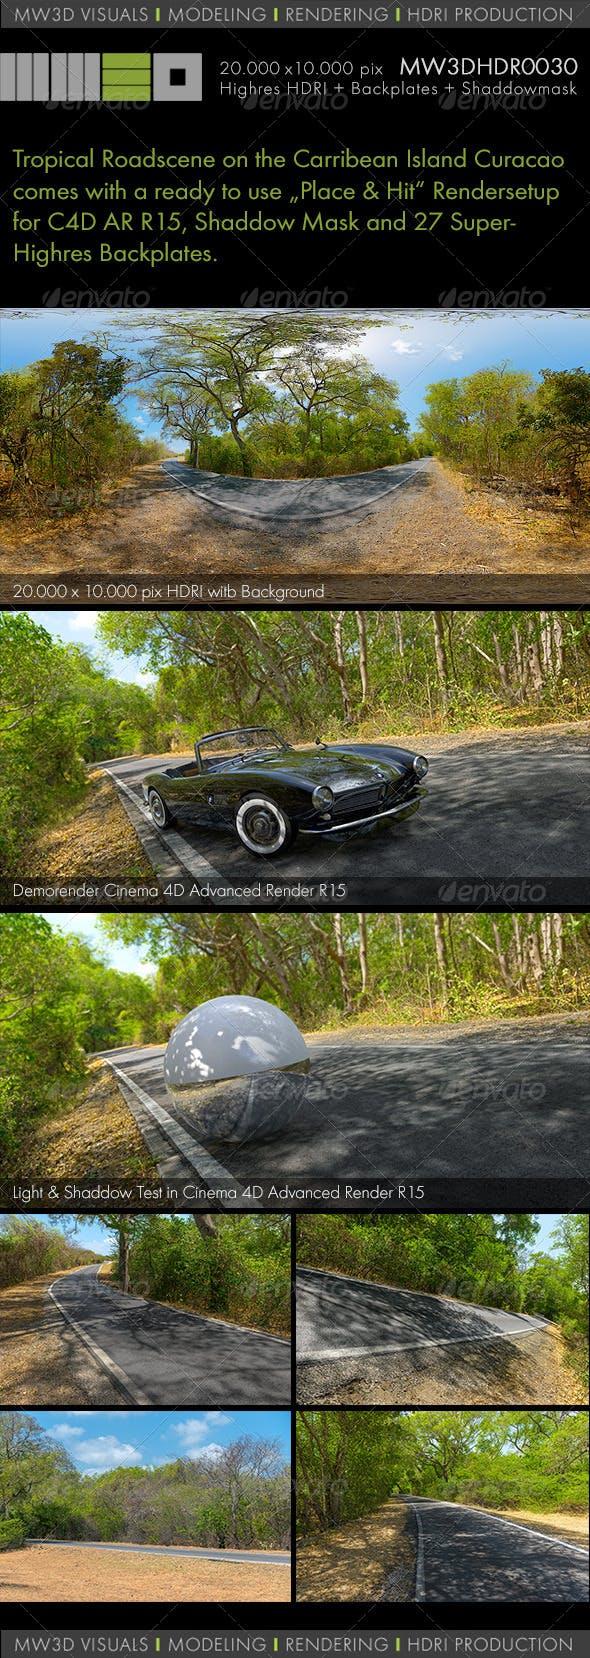 MW3DHDR0030 Roadscene / Carribean Island Curacao - 3DOcean Item for Sale